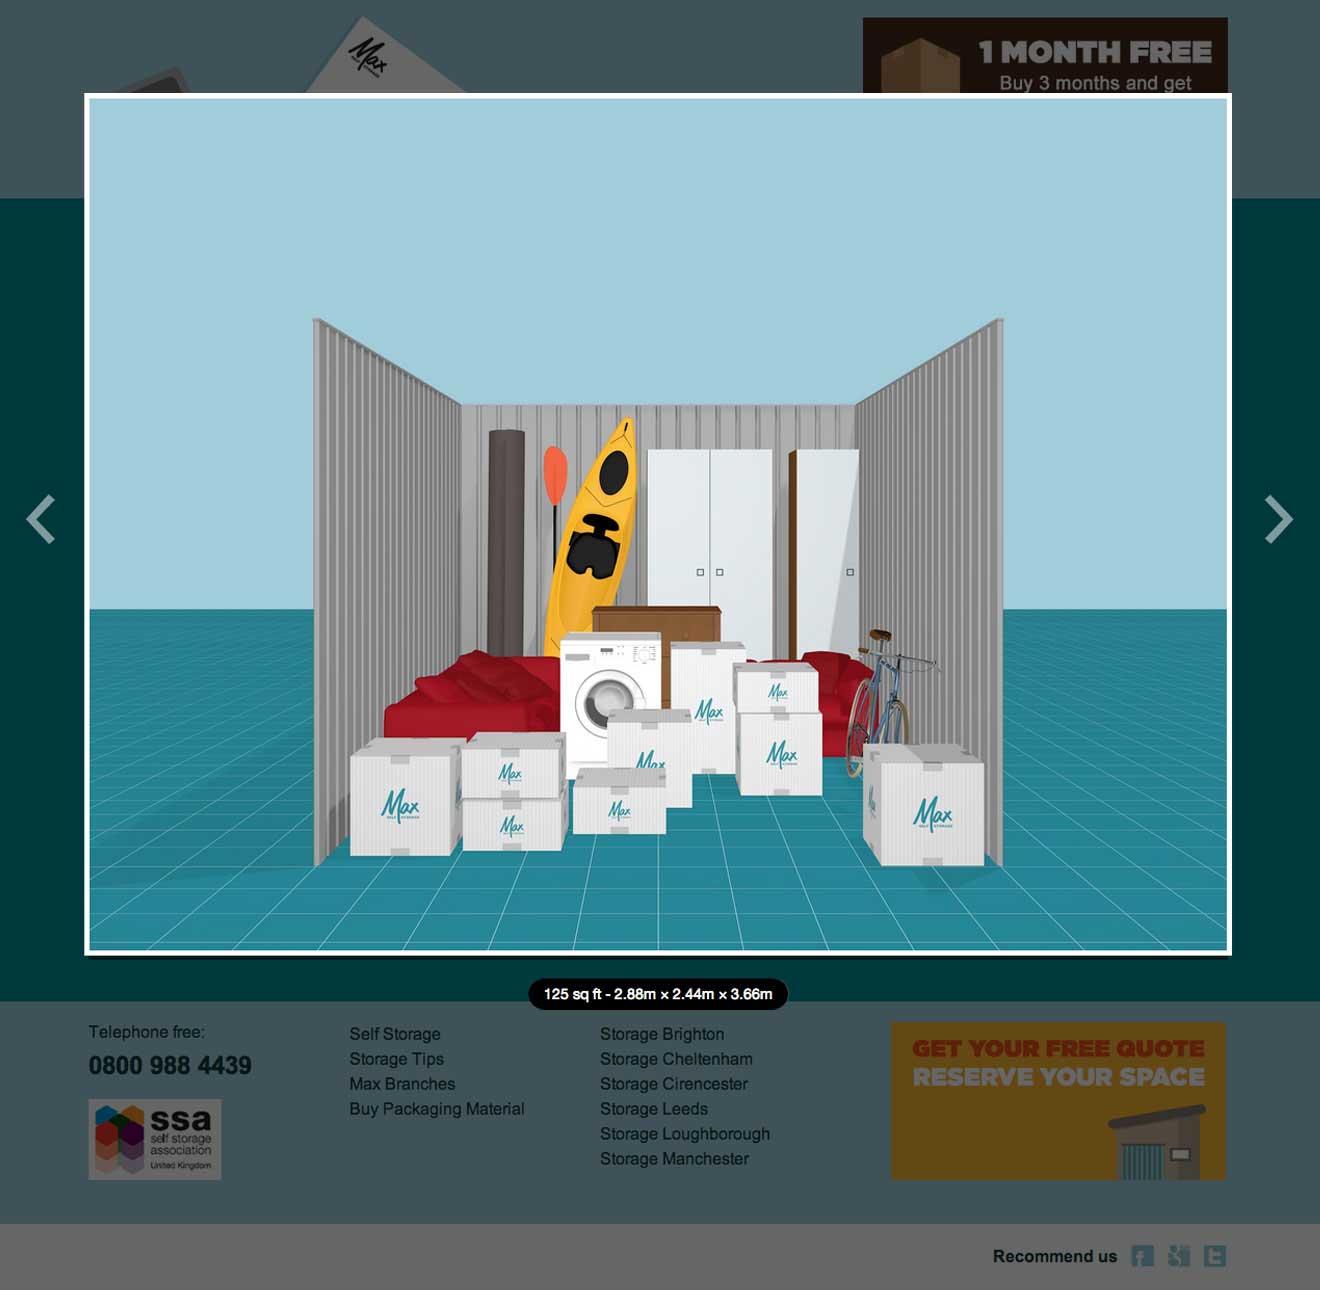 Max Self Storage interactive quote system screenshot